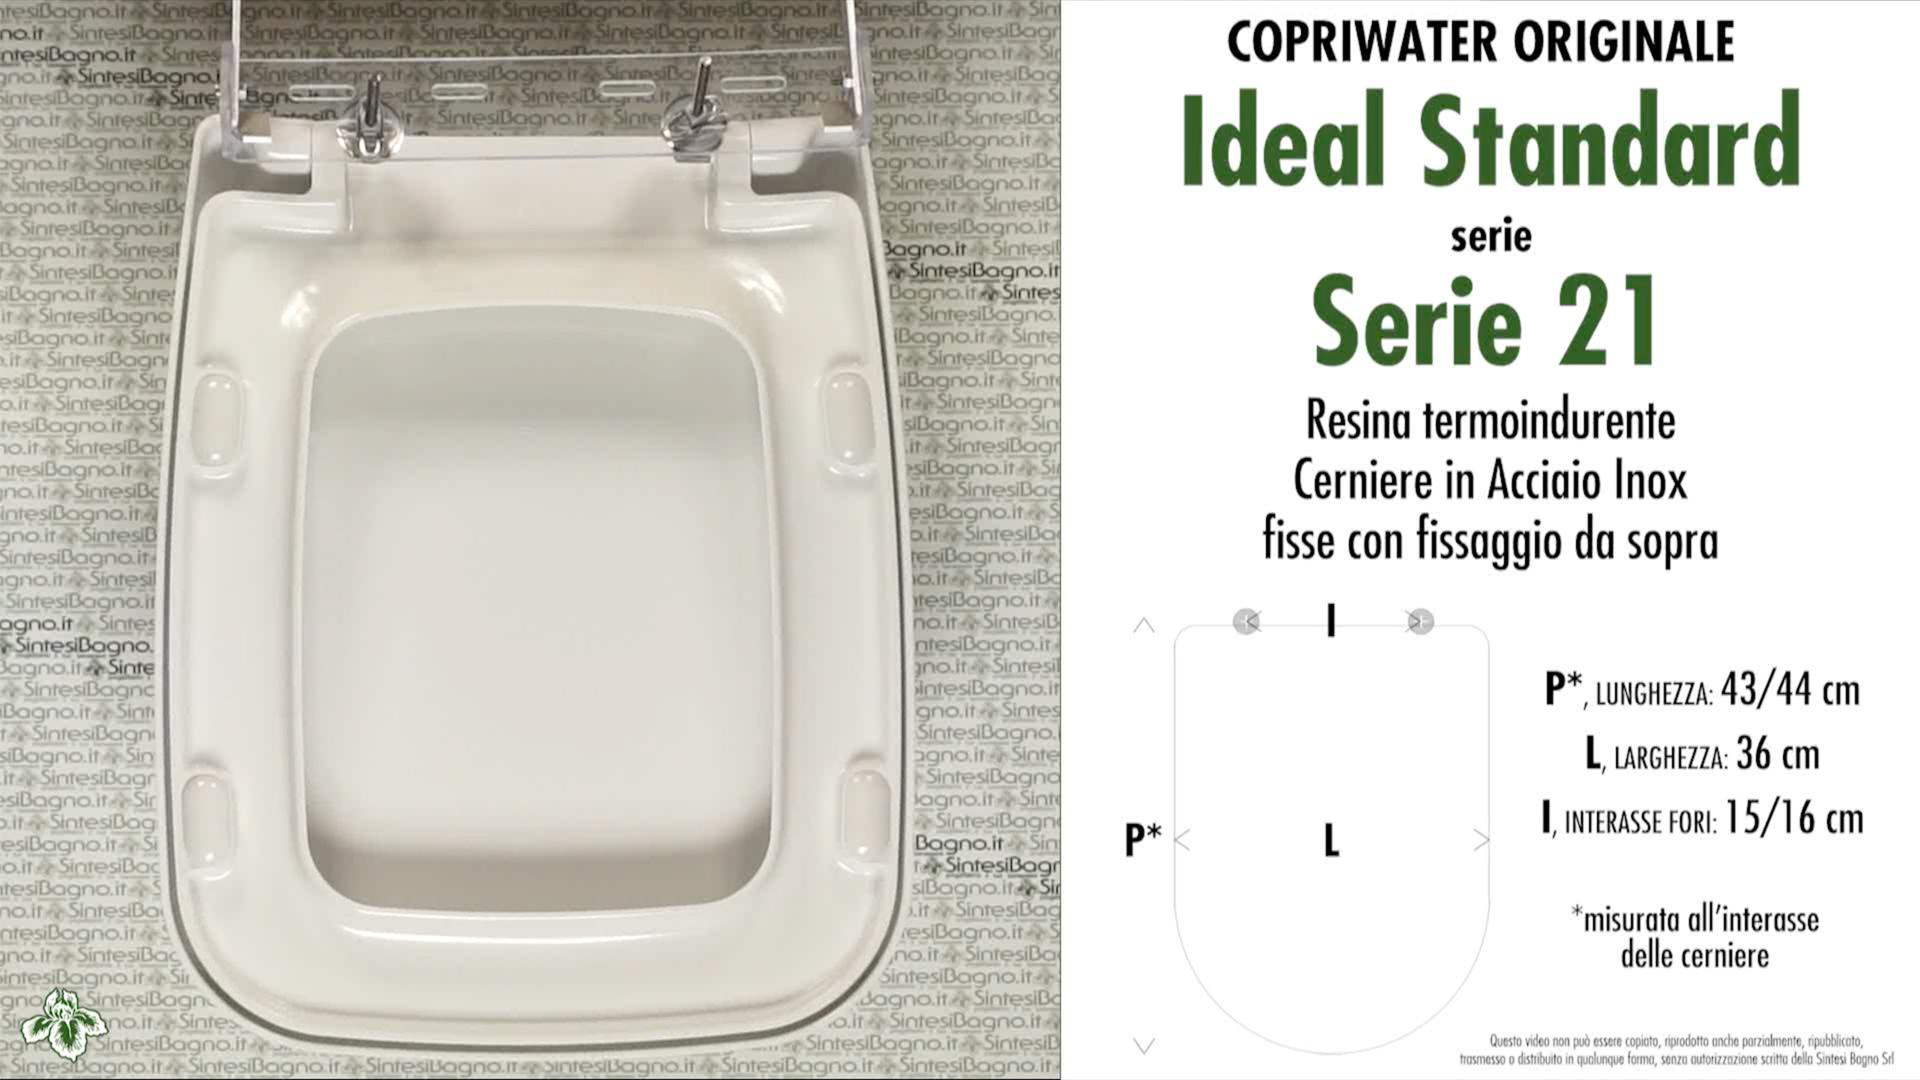 SCHEDA TECNICA MISURE copriwater IDEAL STANDARD SERIE 21